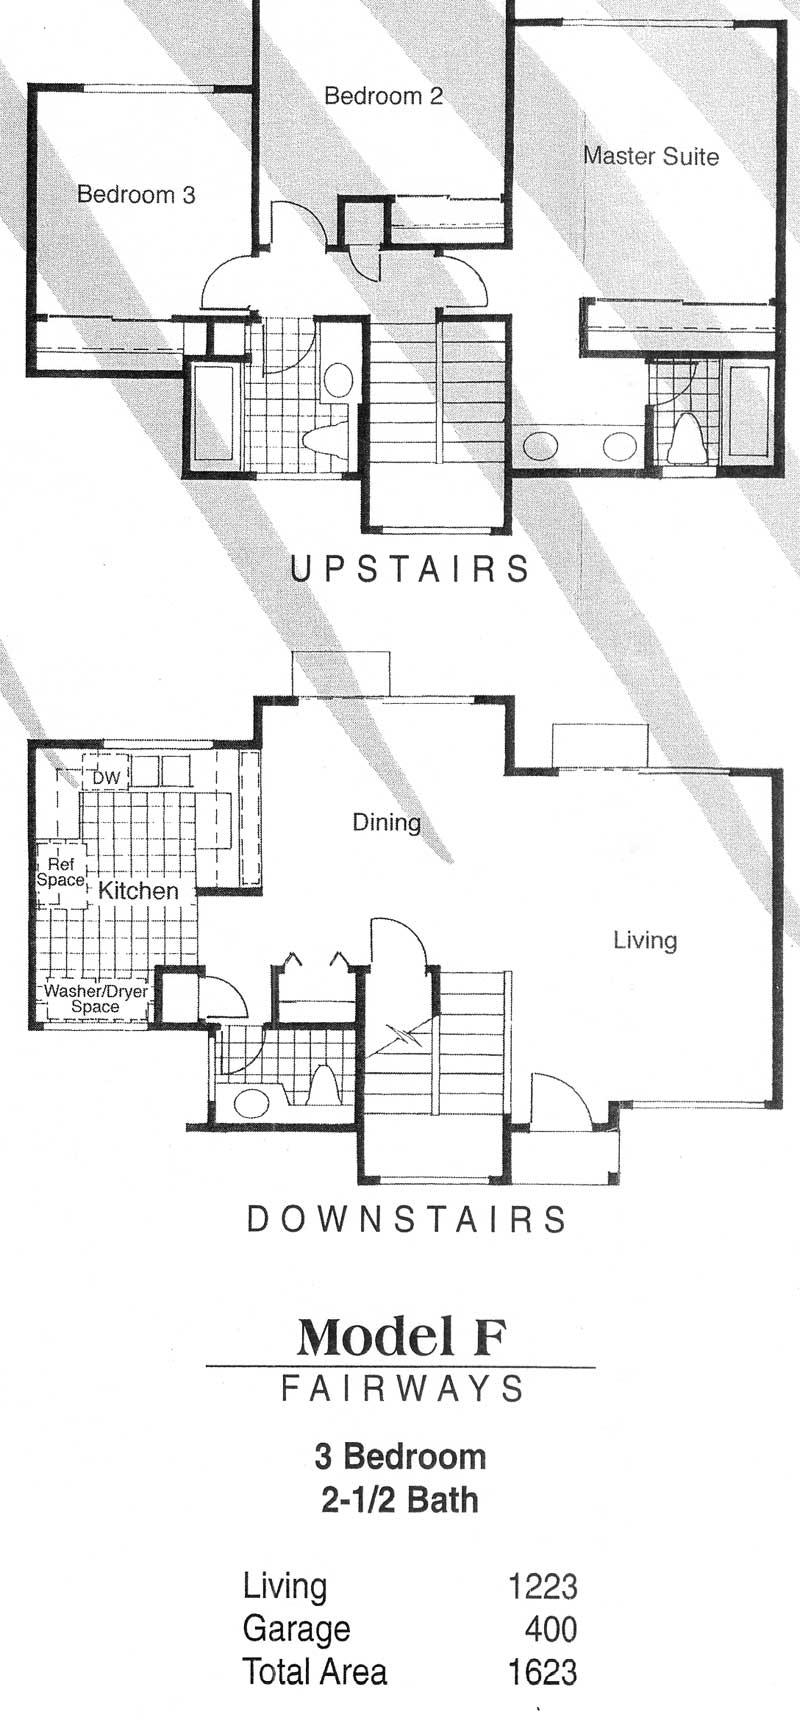 Model F - Fairways 3 bedroom / 2-1/2 bath Living - 1,223 sq. ft. Garage - 400 sq. ft. Total Area - 1,623 sq. ft.